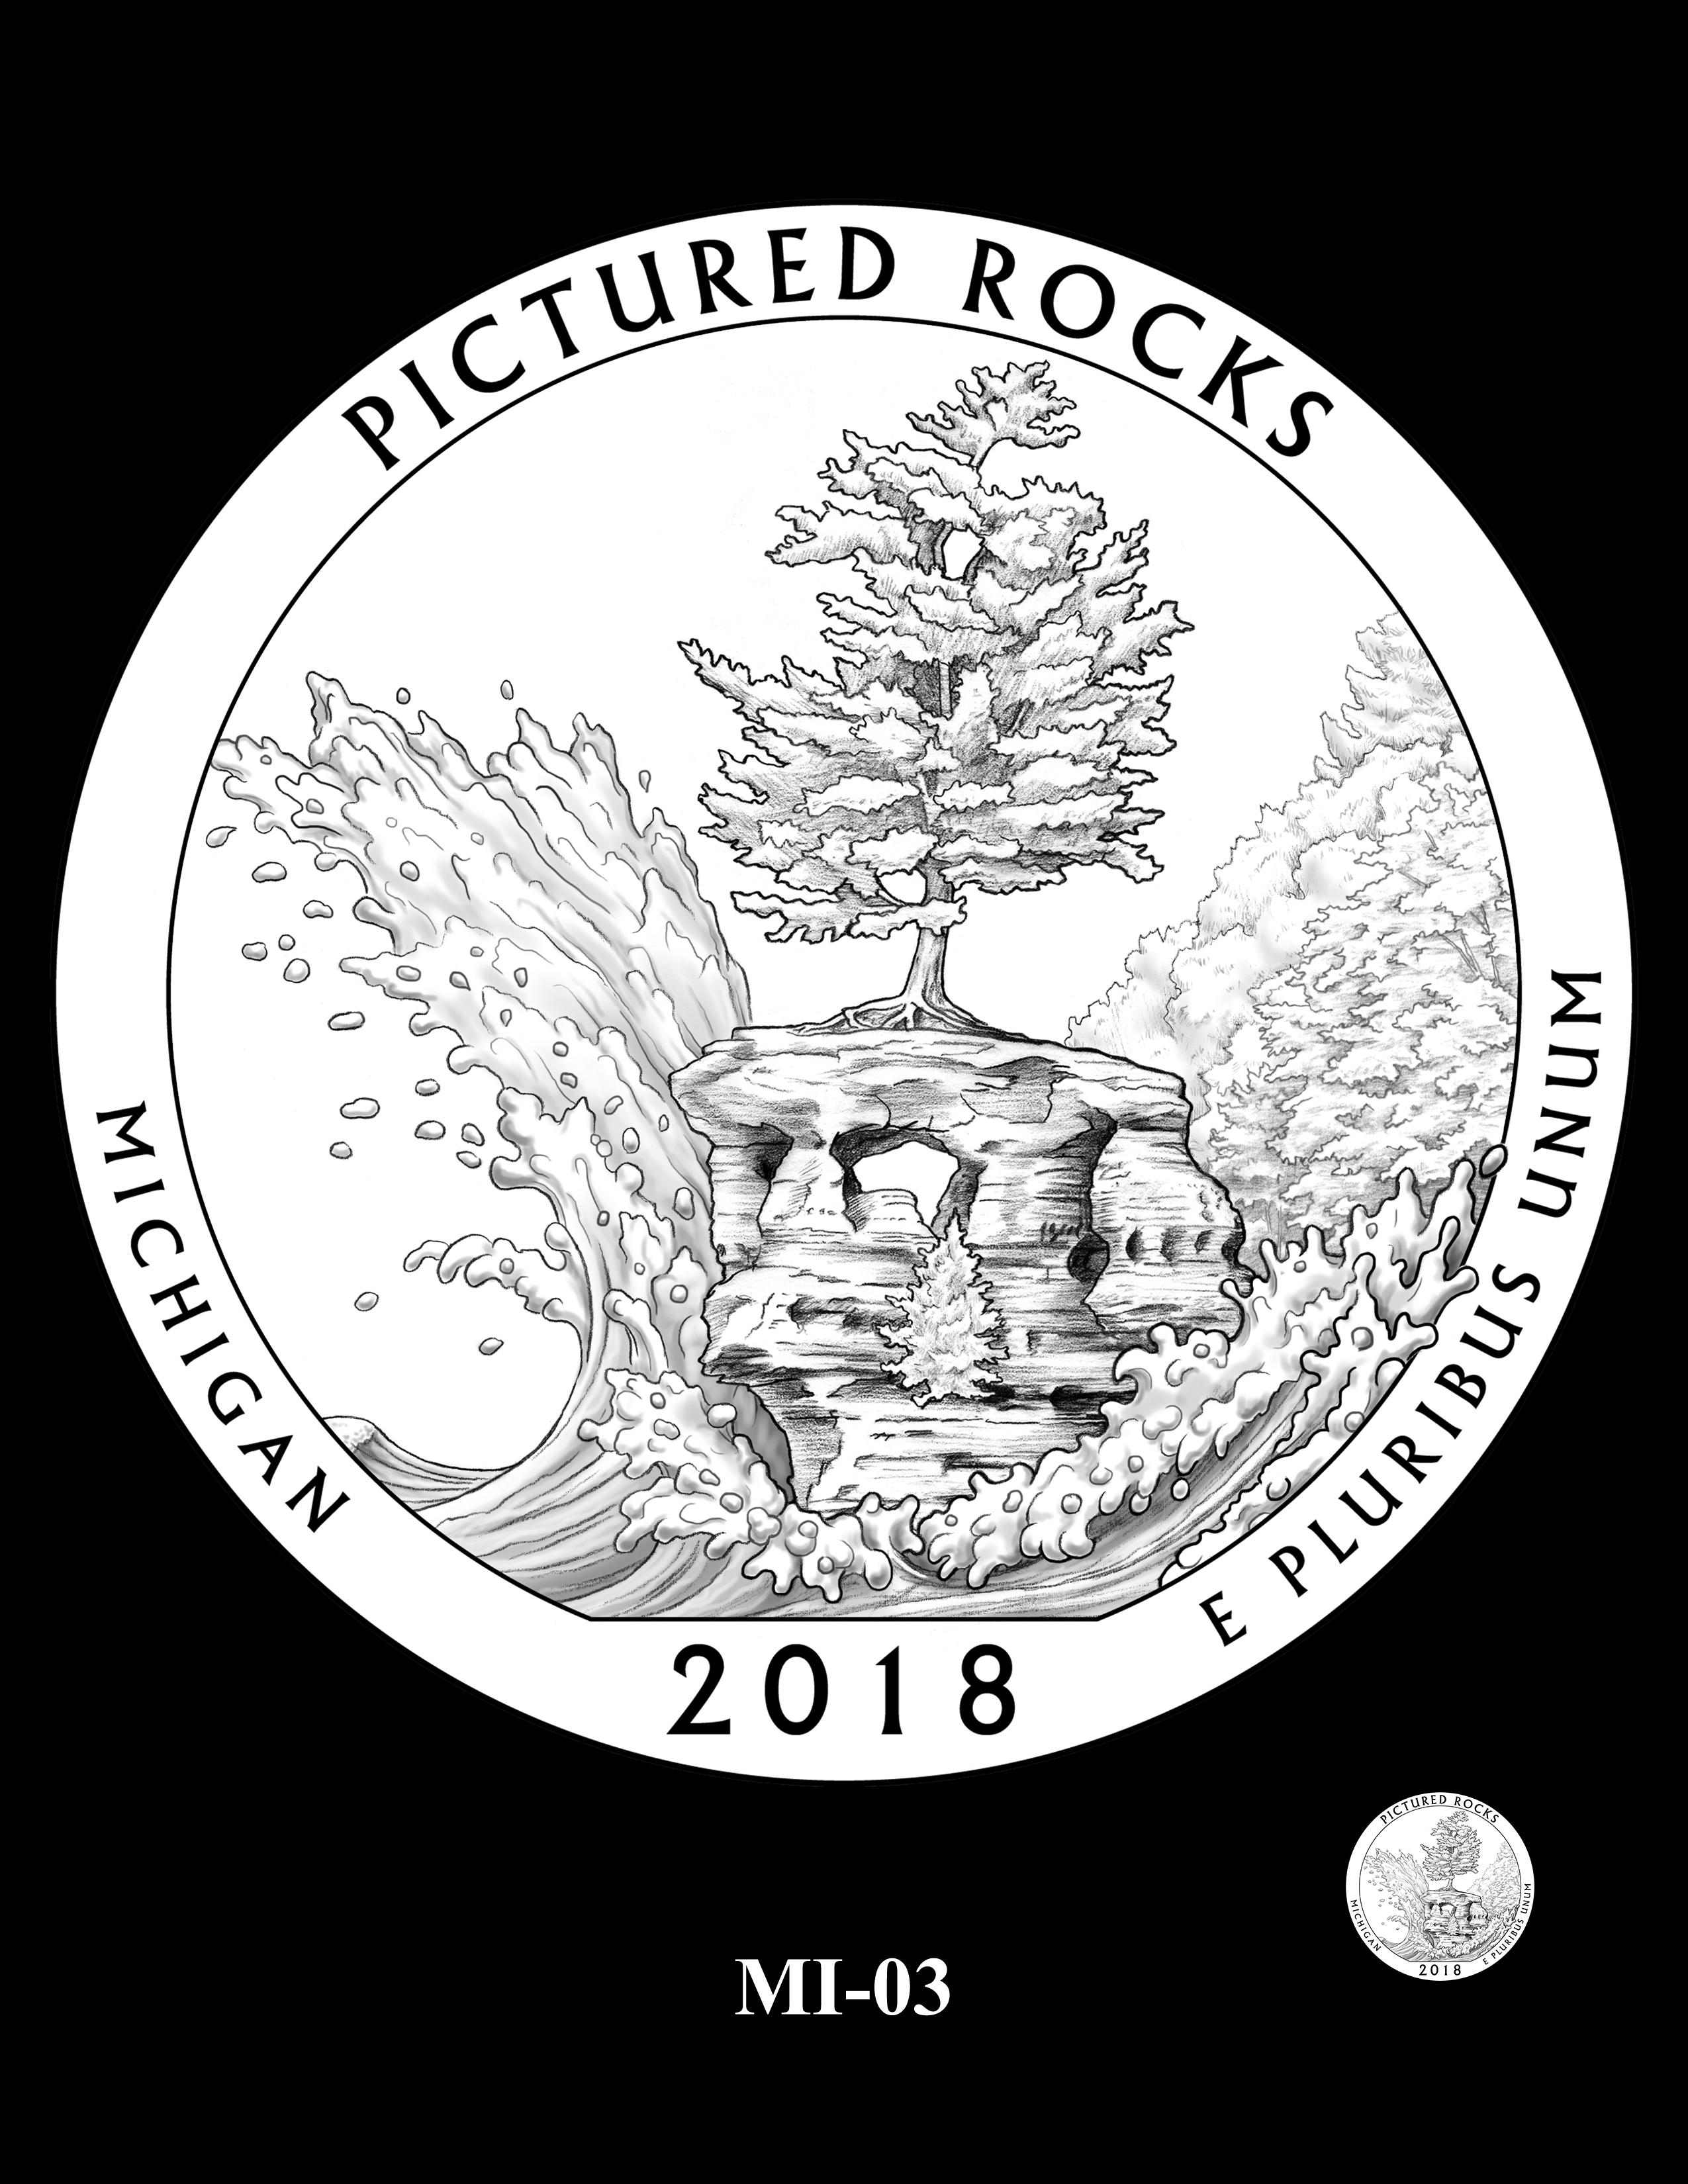 MI-03 -- 2018 America the Beautiful® Quarters Program